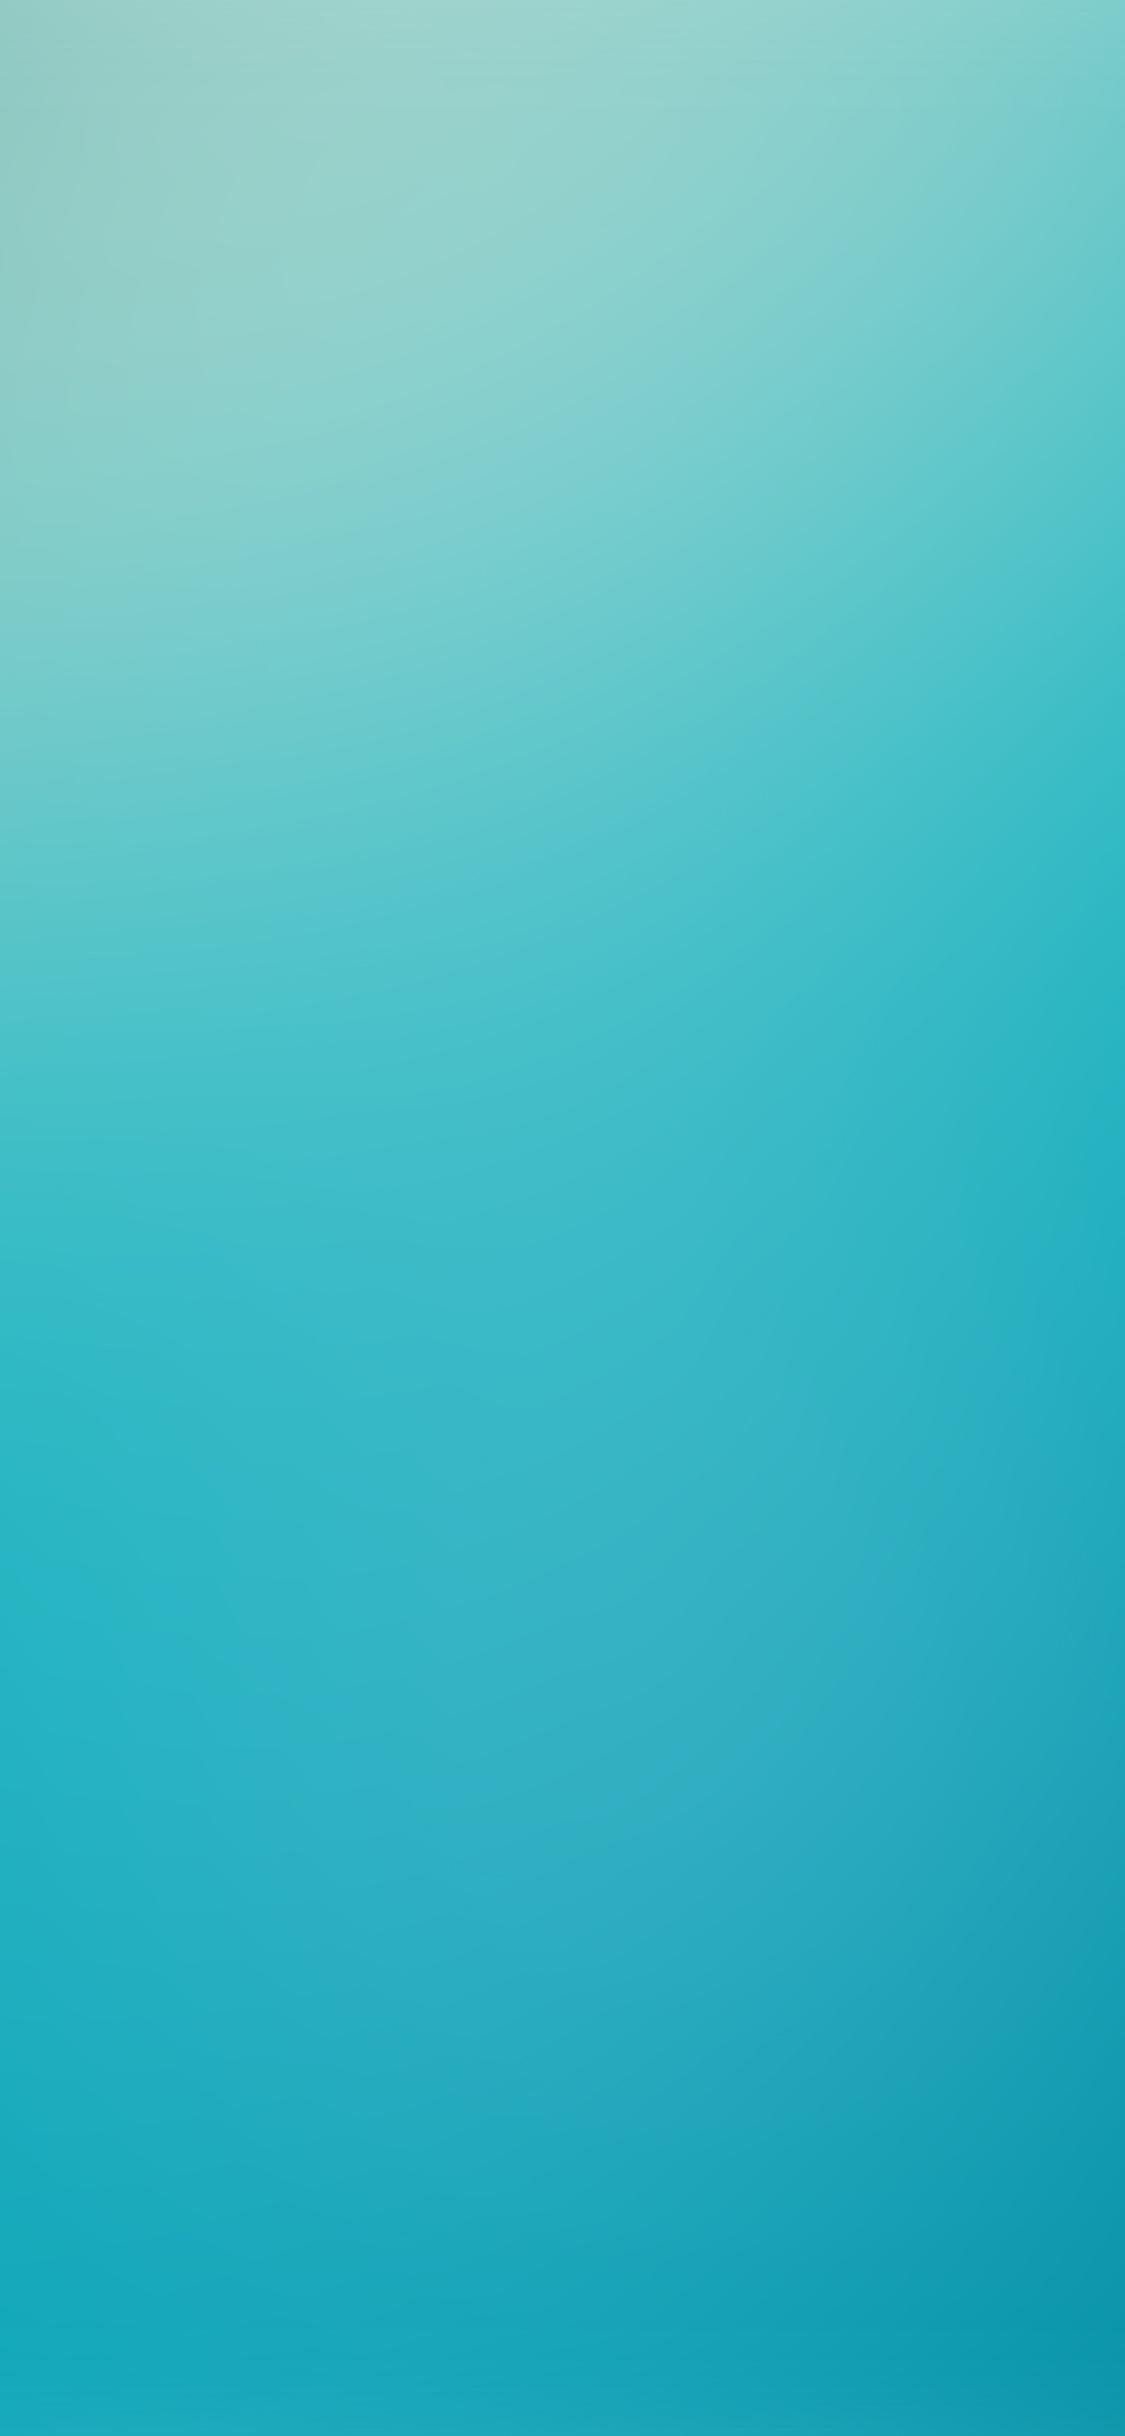 iPhoneXpapers.com-Apple-iPhone-wallpaper-si78-linden-artwork-blue-sky-gradation-blur